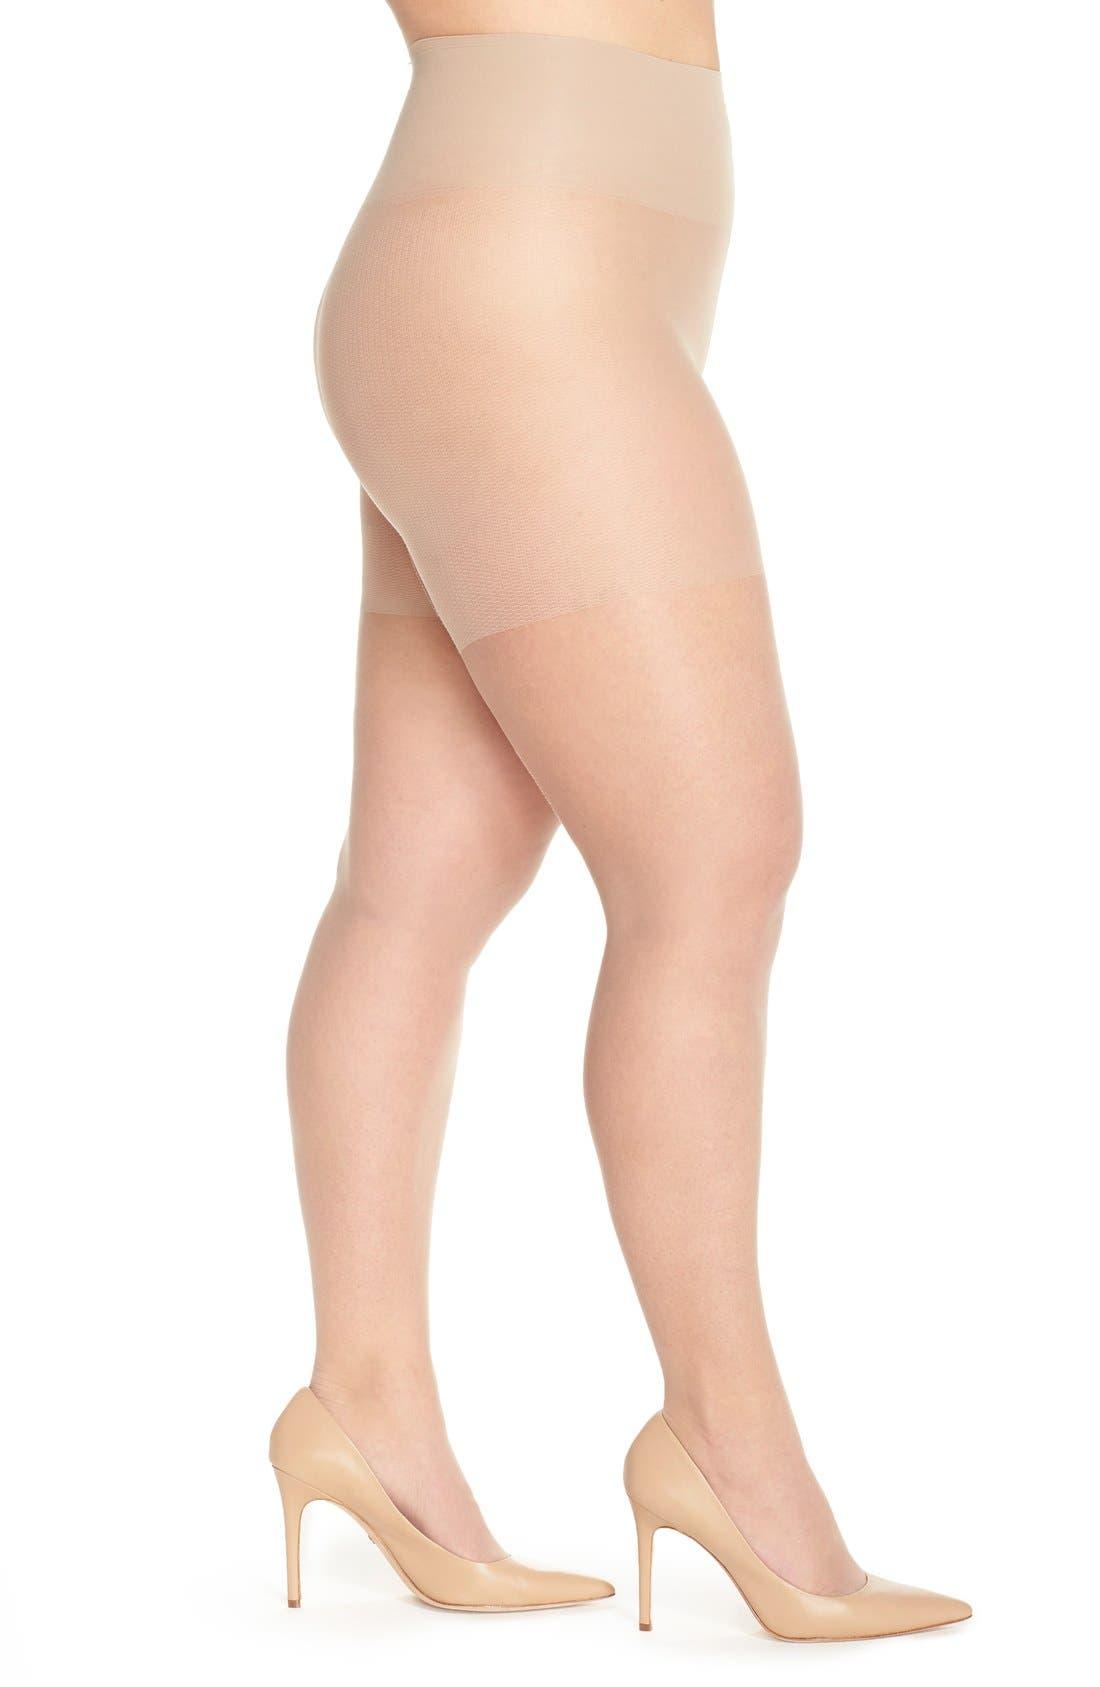 BERKSHIRE Tummy Control Pantyhose